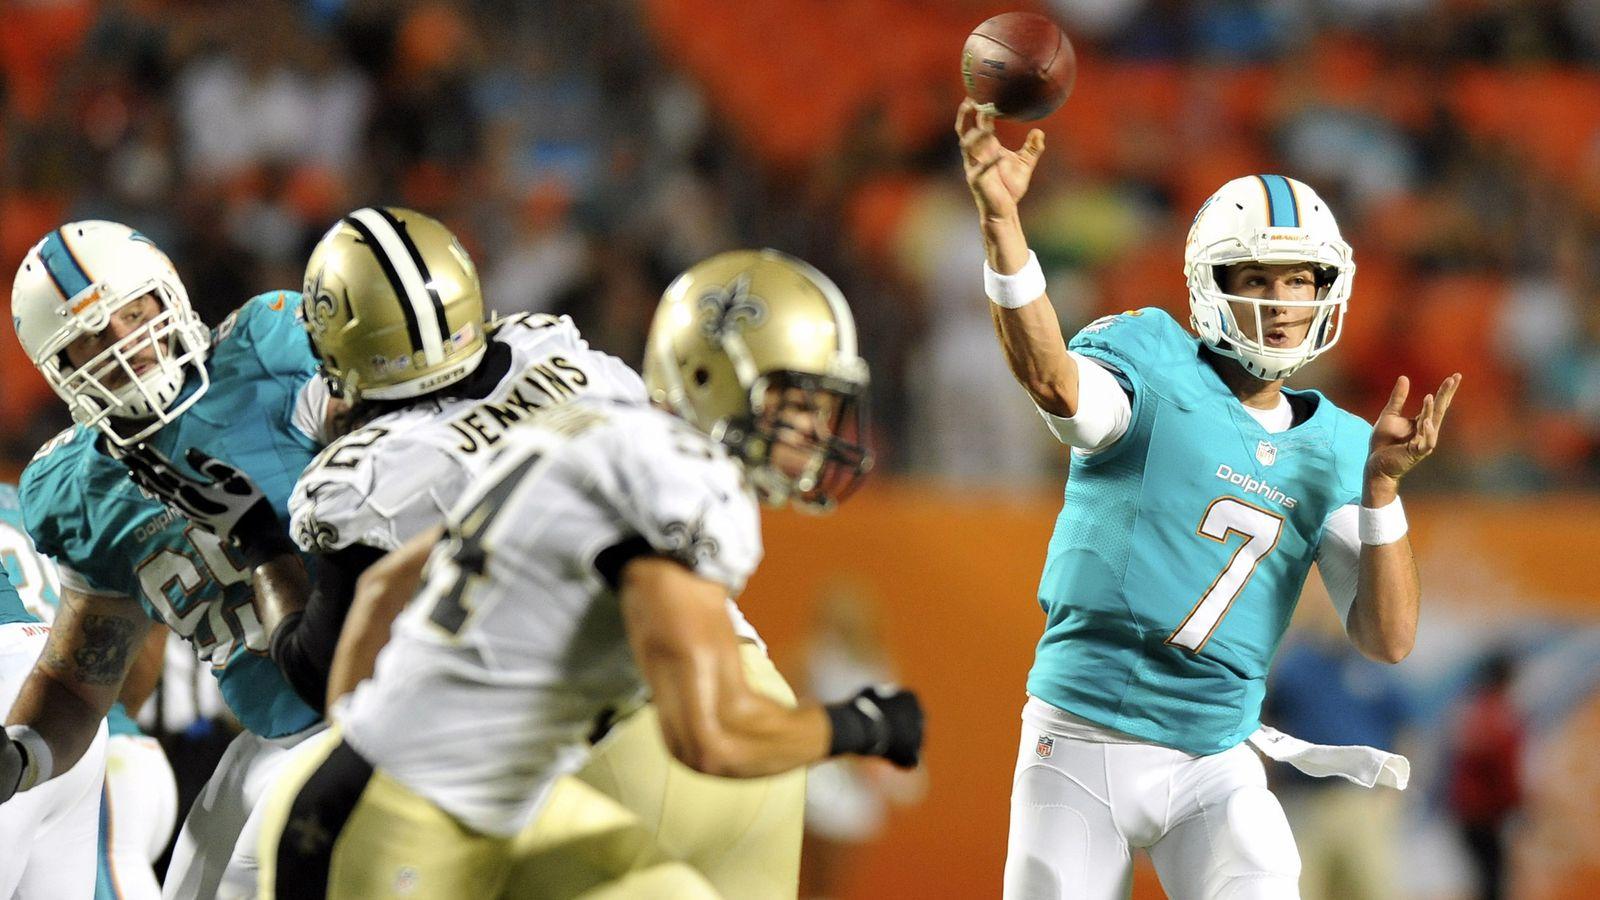 Saints vs. Dolphins 2013赛季结果:迈阿密结束了新奥尔良不败的季前赛,24-21